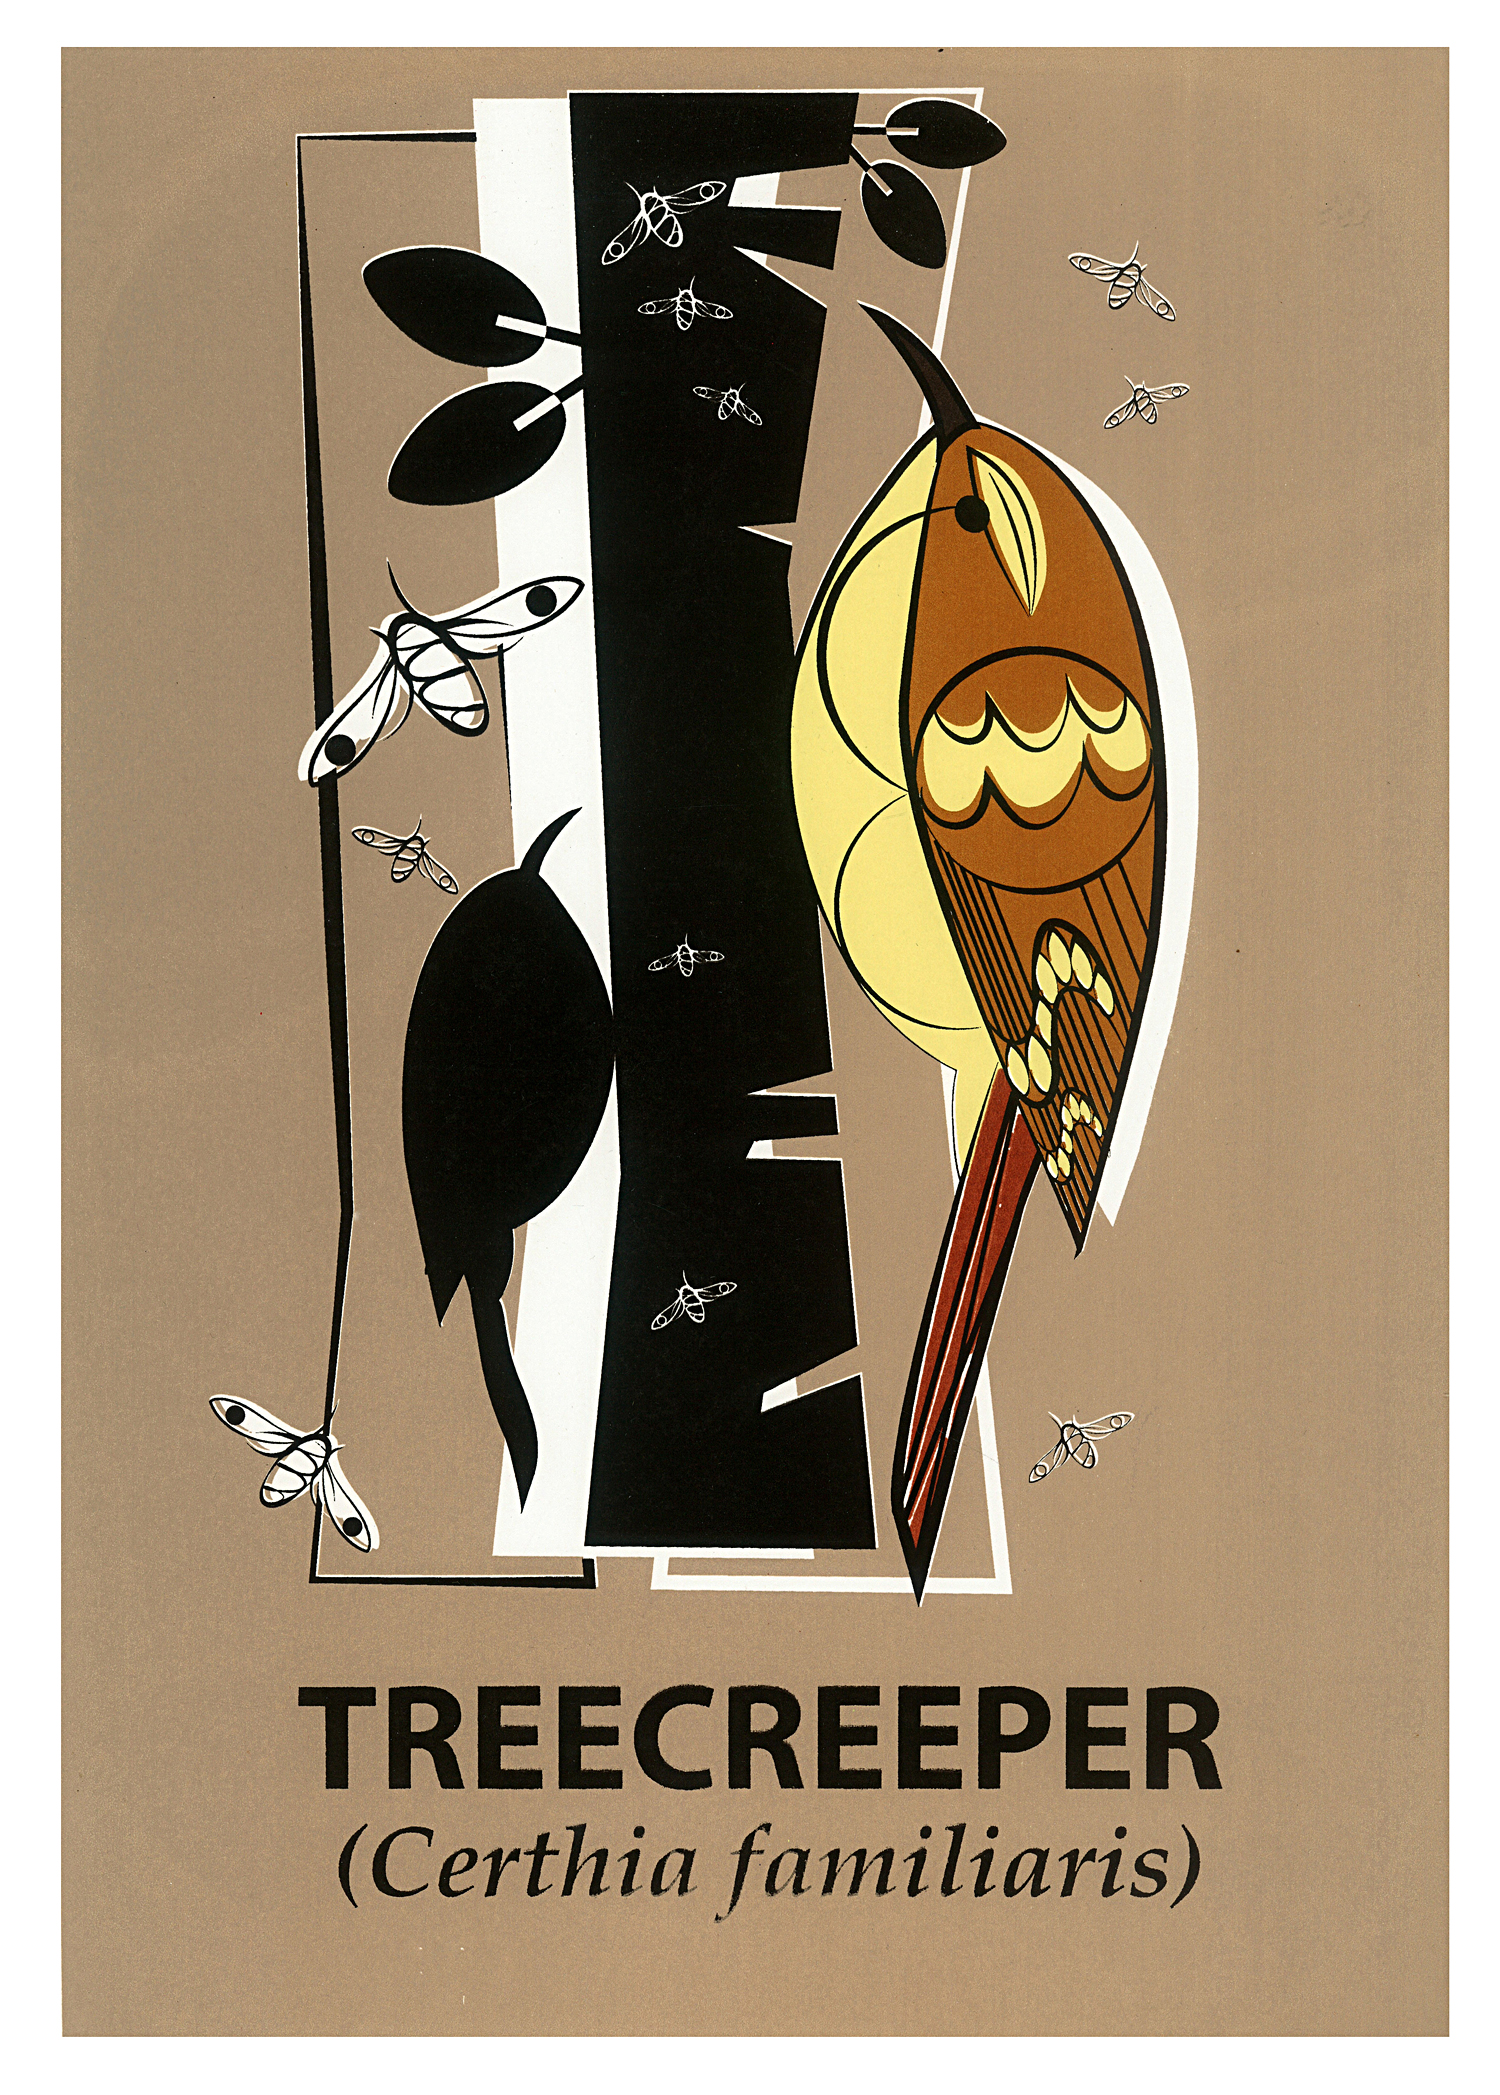 Limited Edition Treecreeper Screenprint